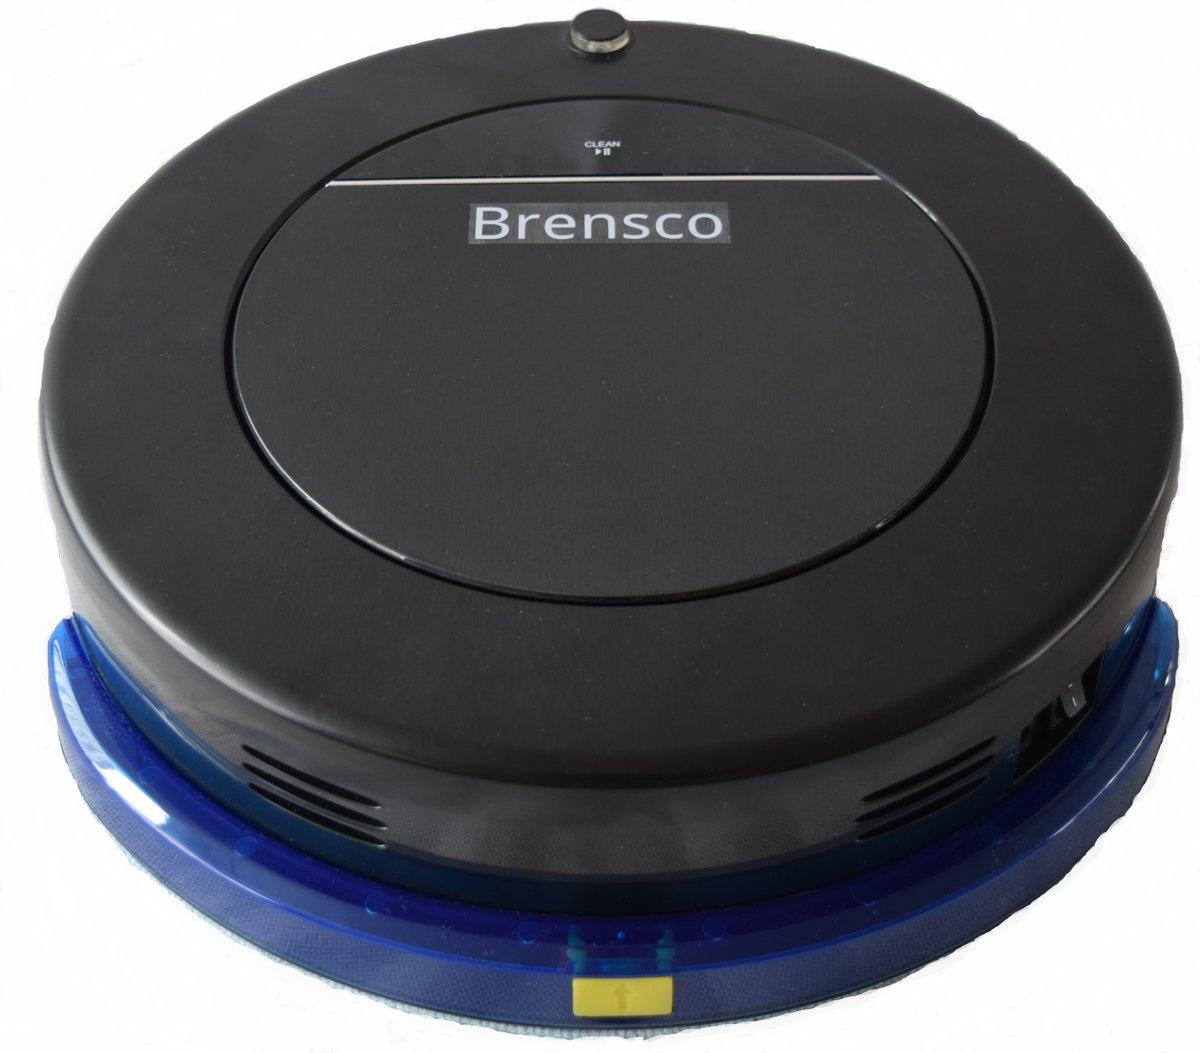 Brensco x009A Robotstofzuiger - dweilrobot - oplaad station - afstandbediening kopen